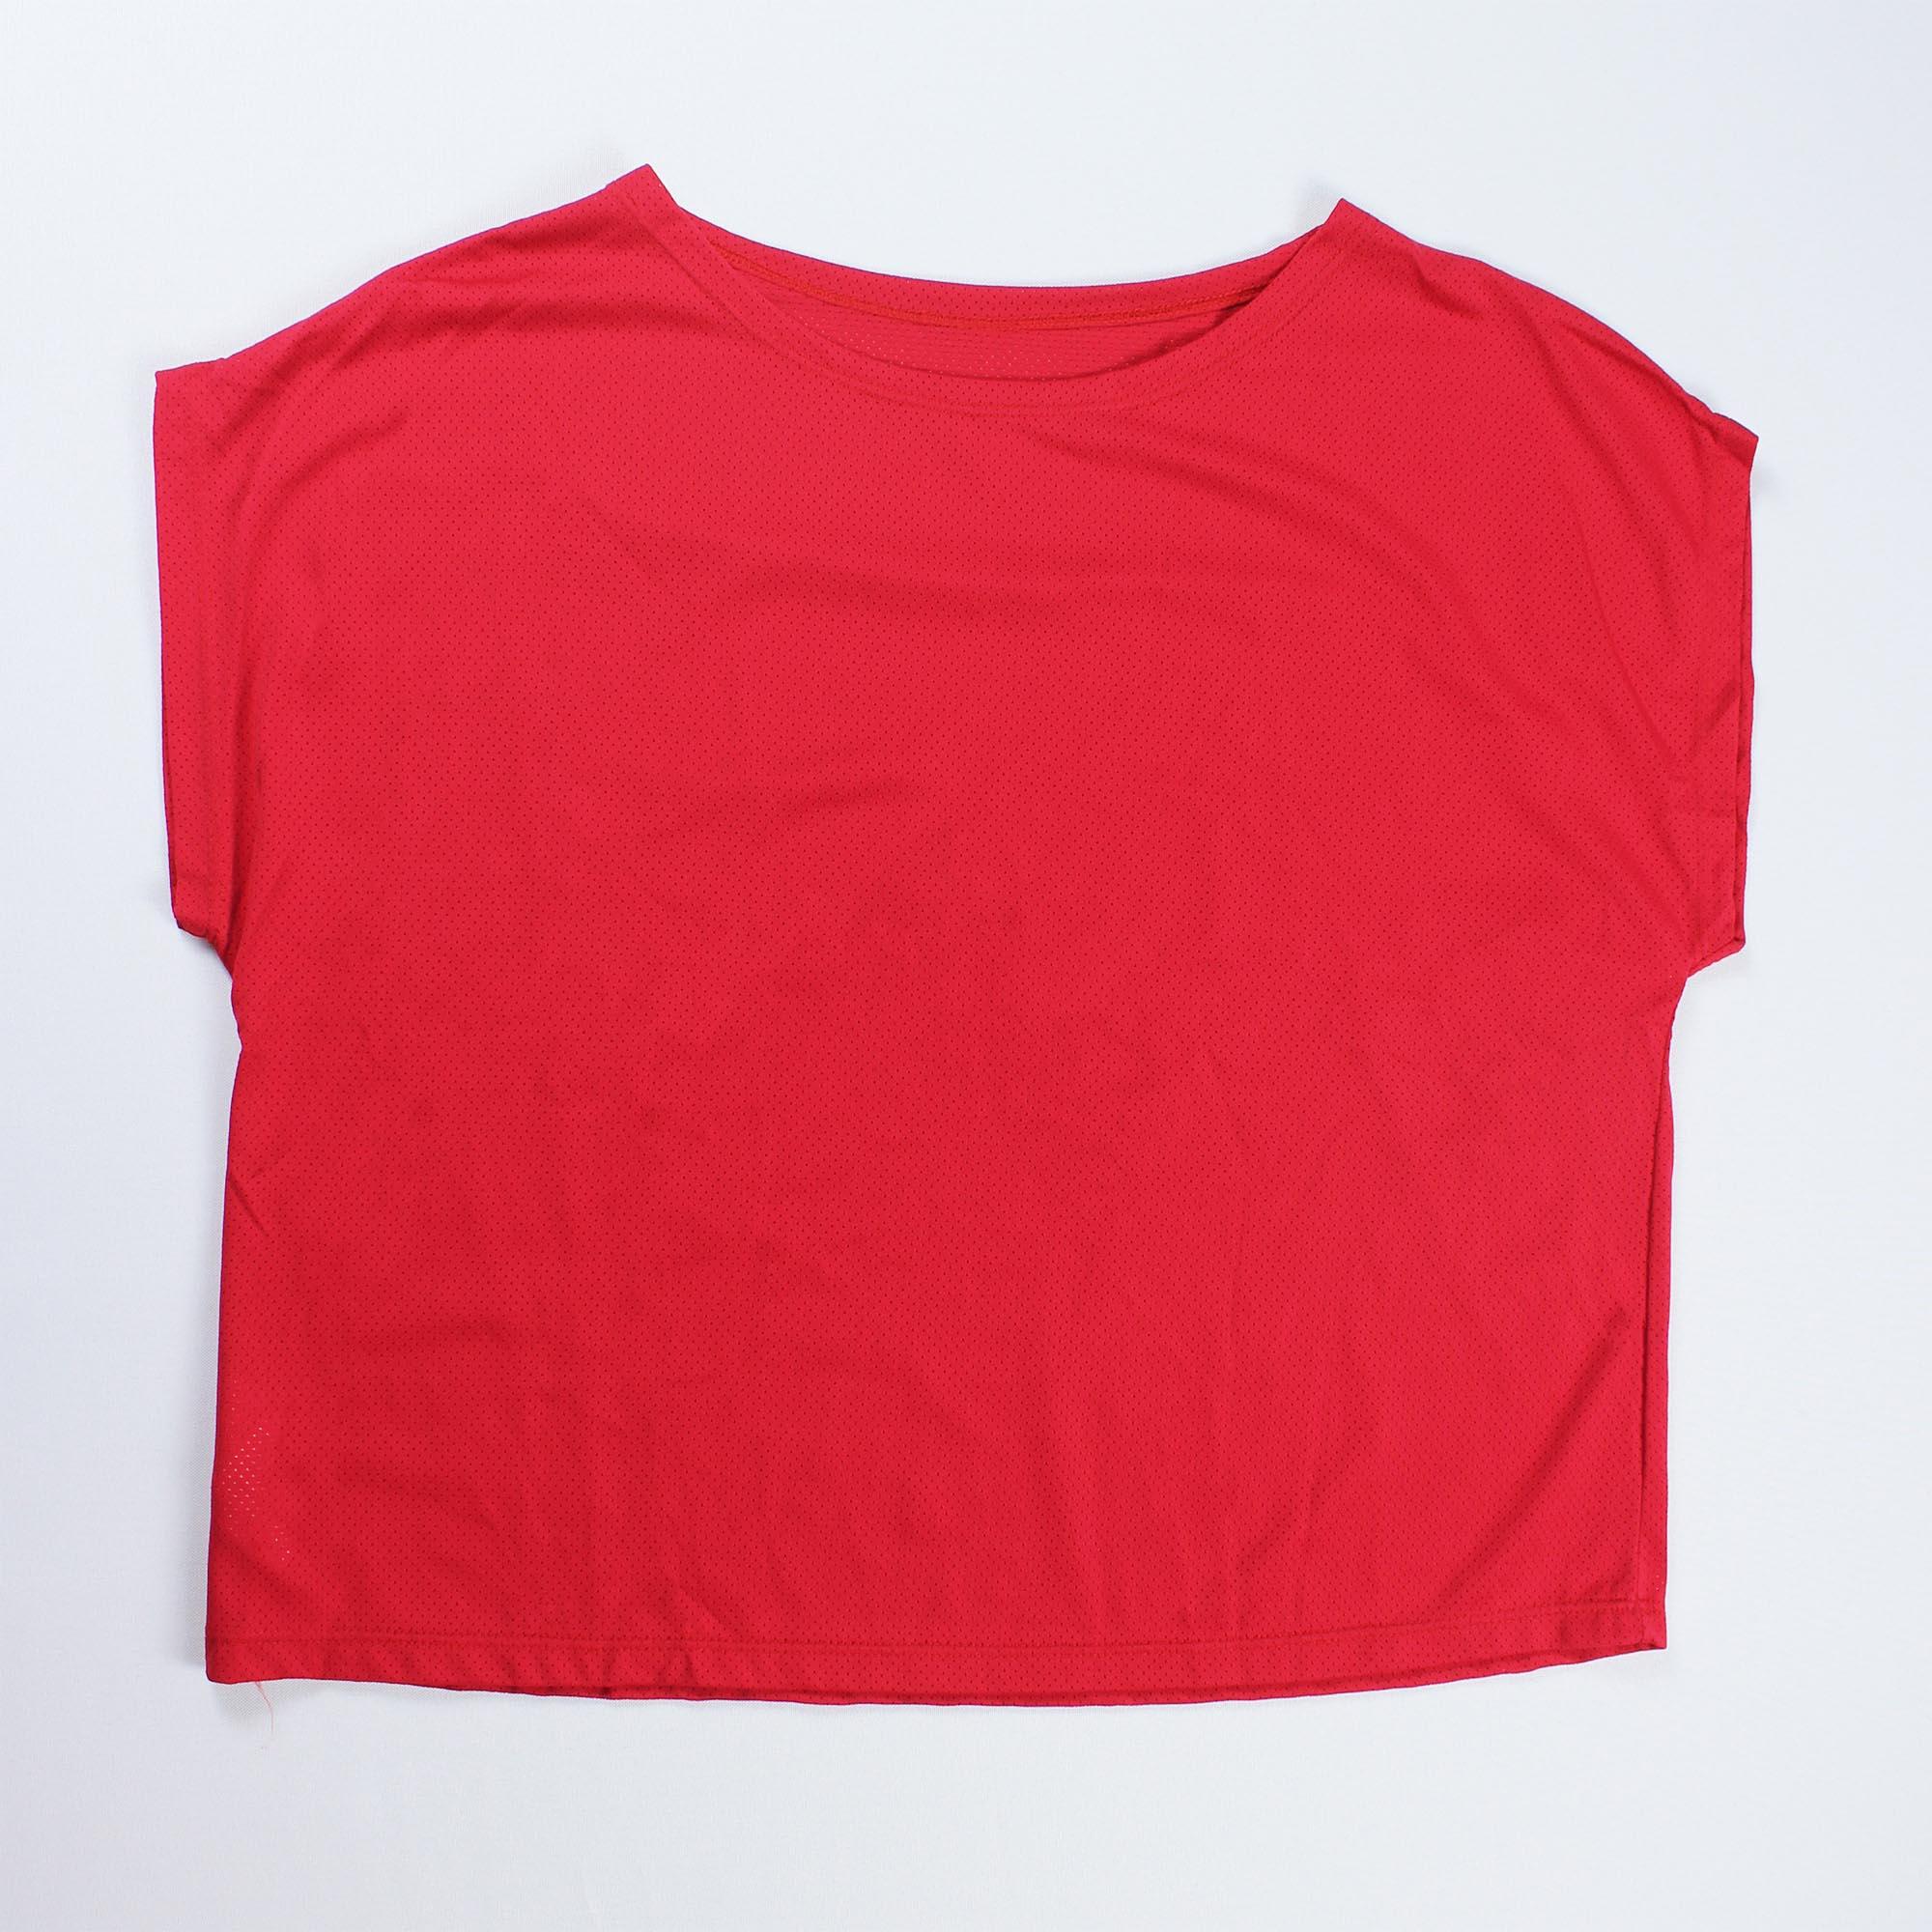 Blusa Cropped Feminina - Vermelha